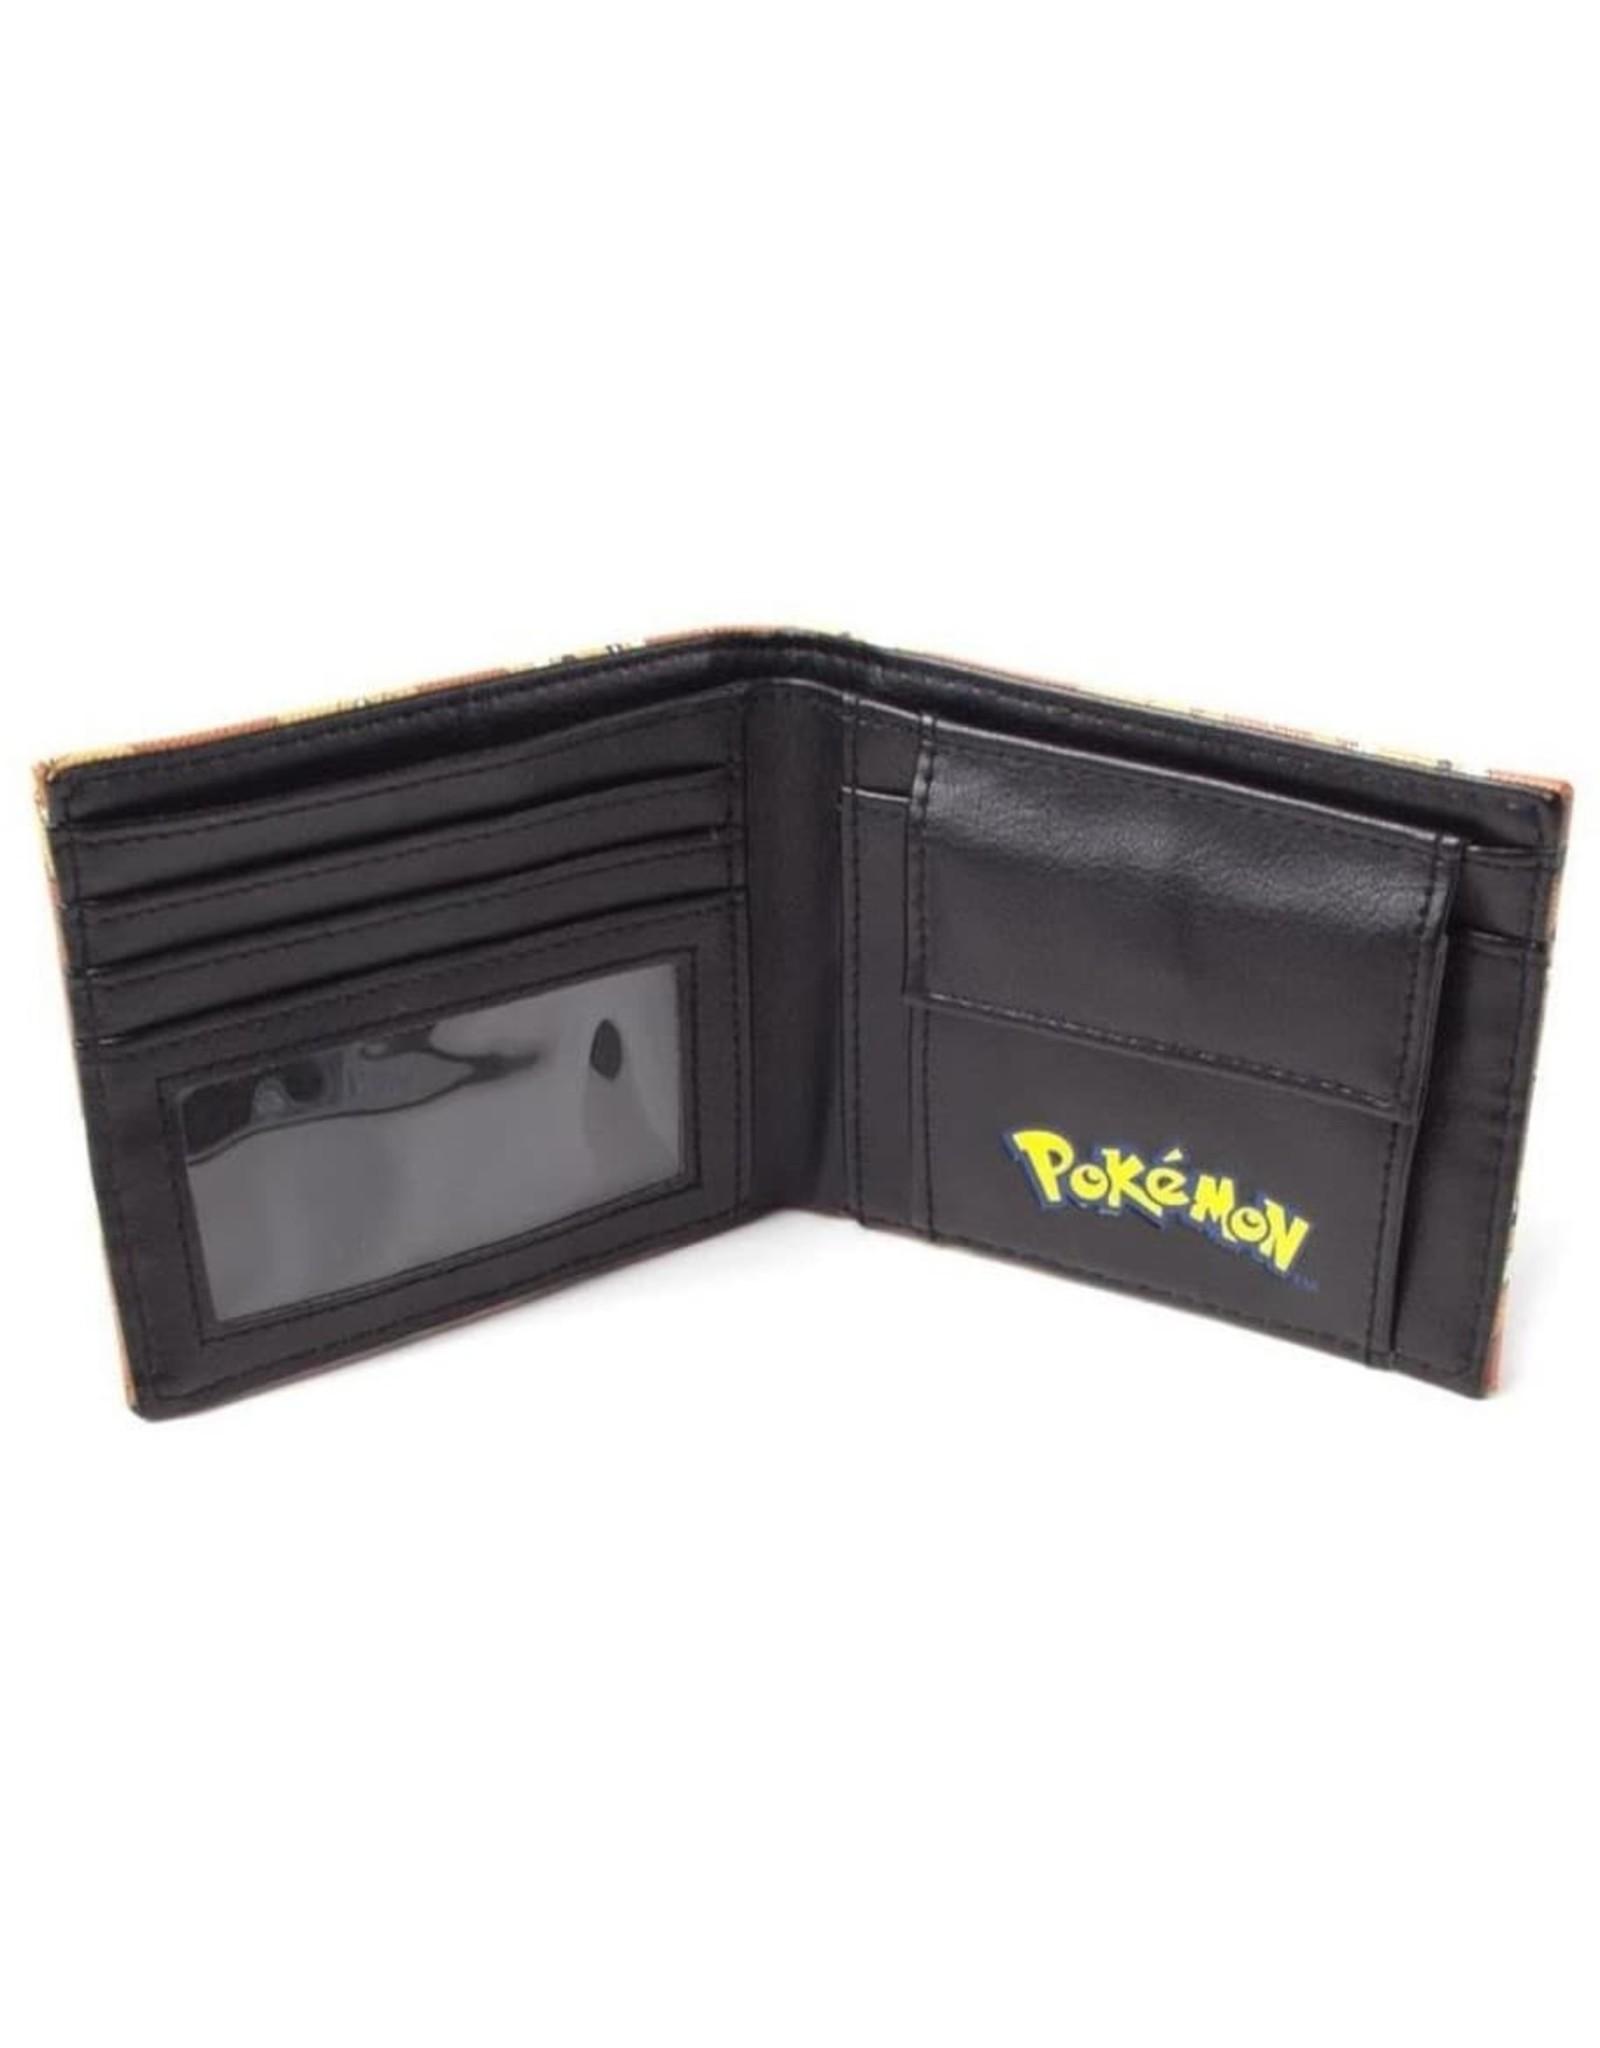 Pokemon Merchandise portemonnees - Pokemon Eevee portemonnee